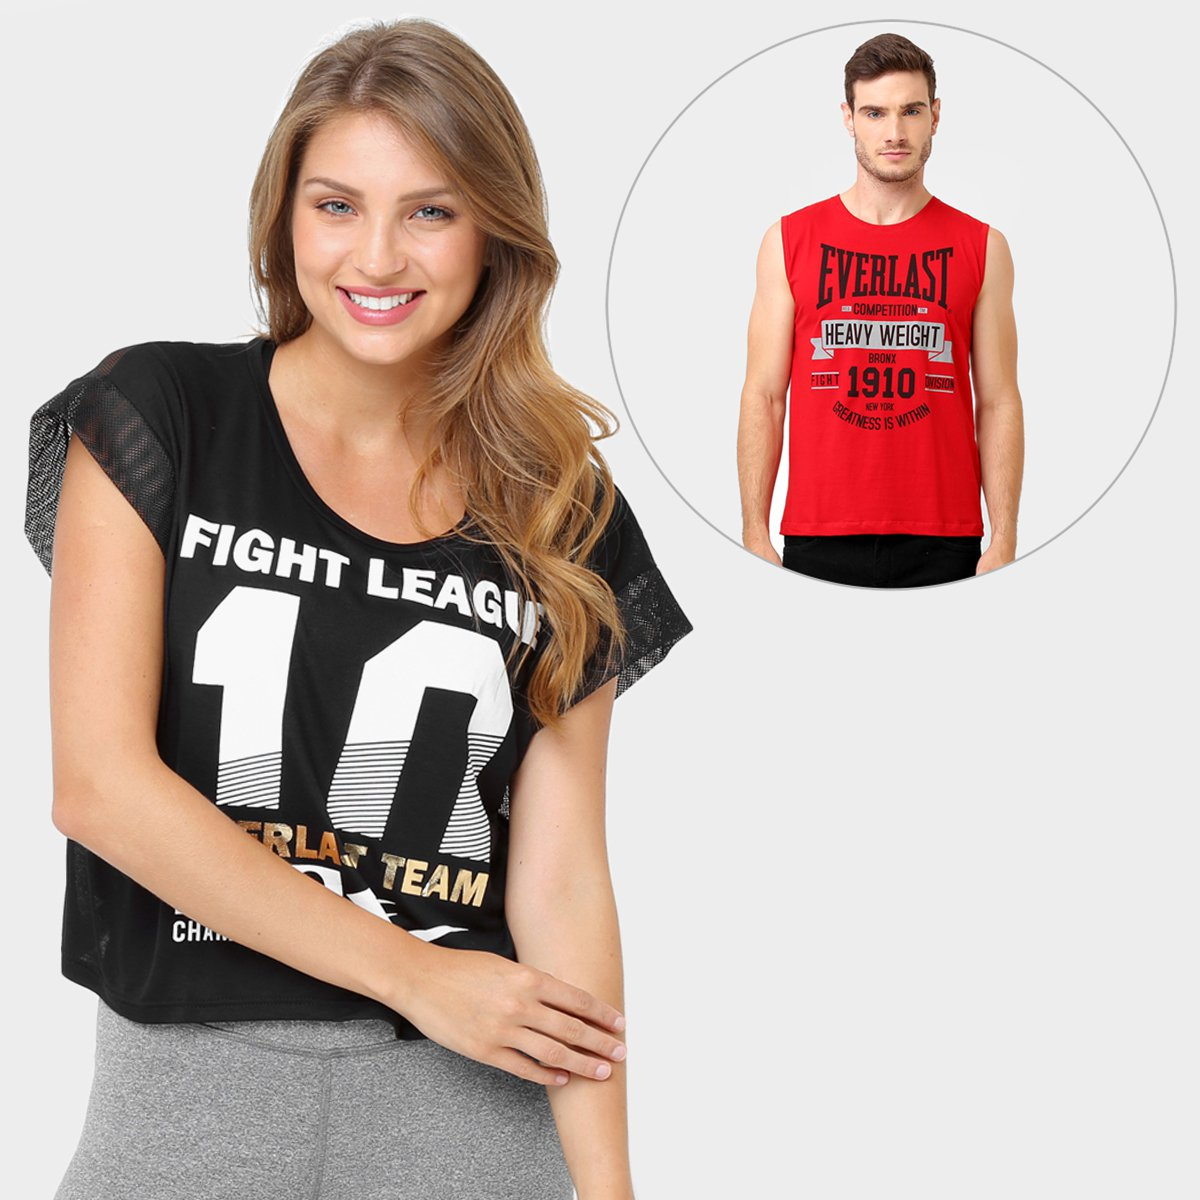 Kit Camiseta Everlast Cropped + Camiseta Regata Everlast - Compre Agora  2265b98fdf7